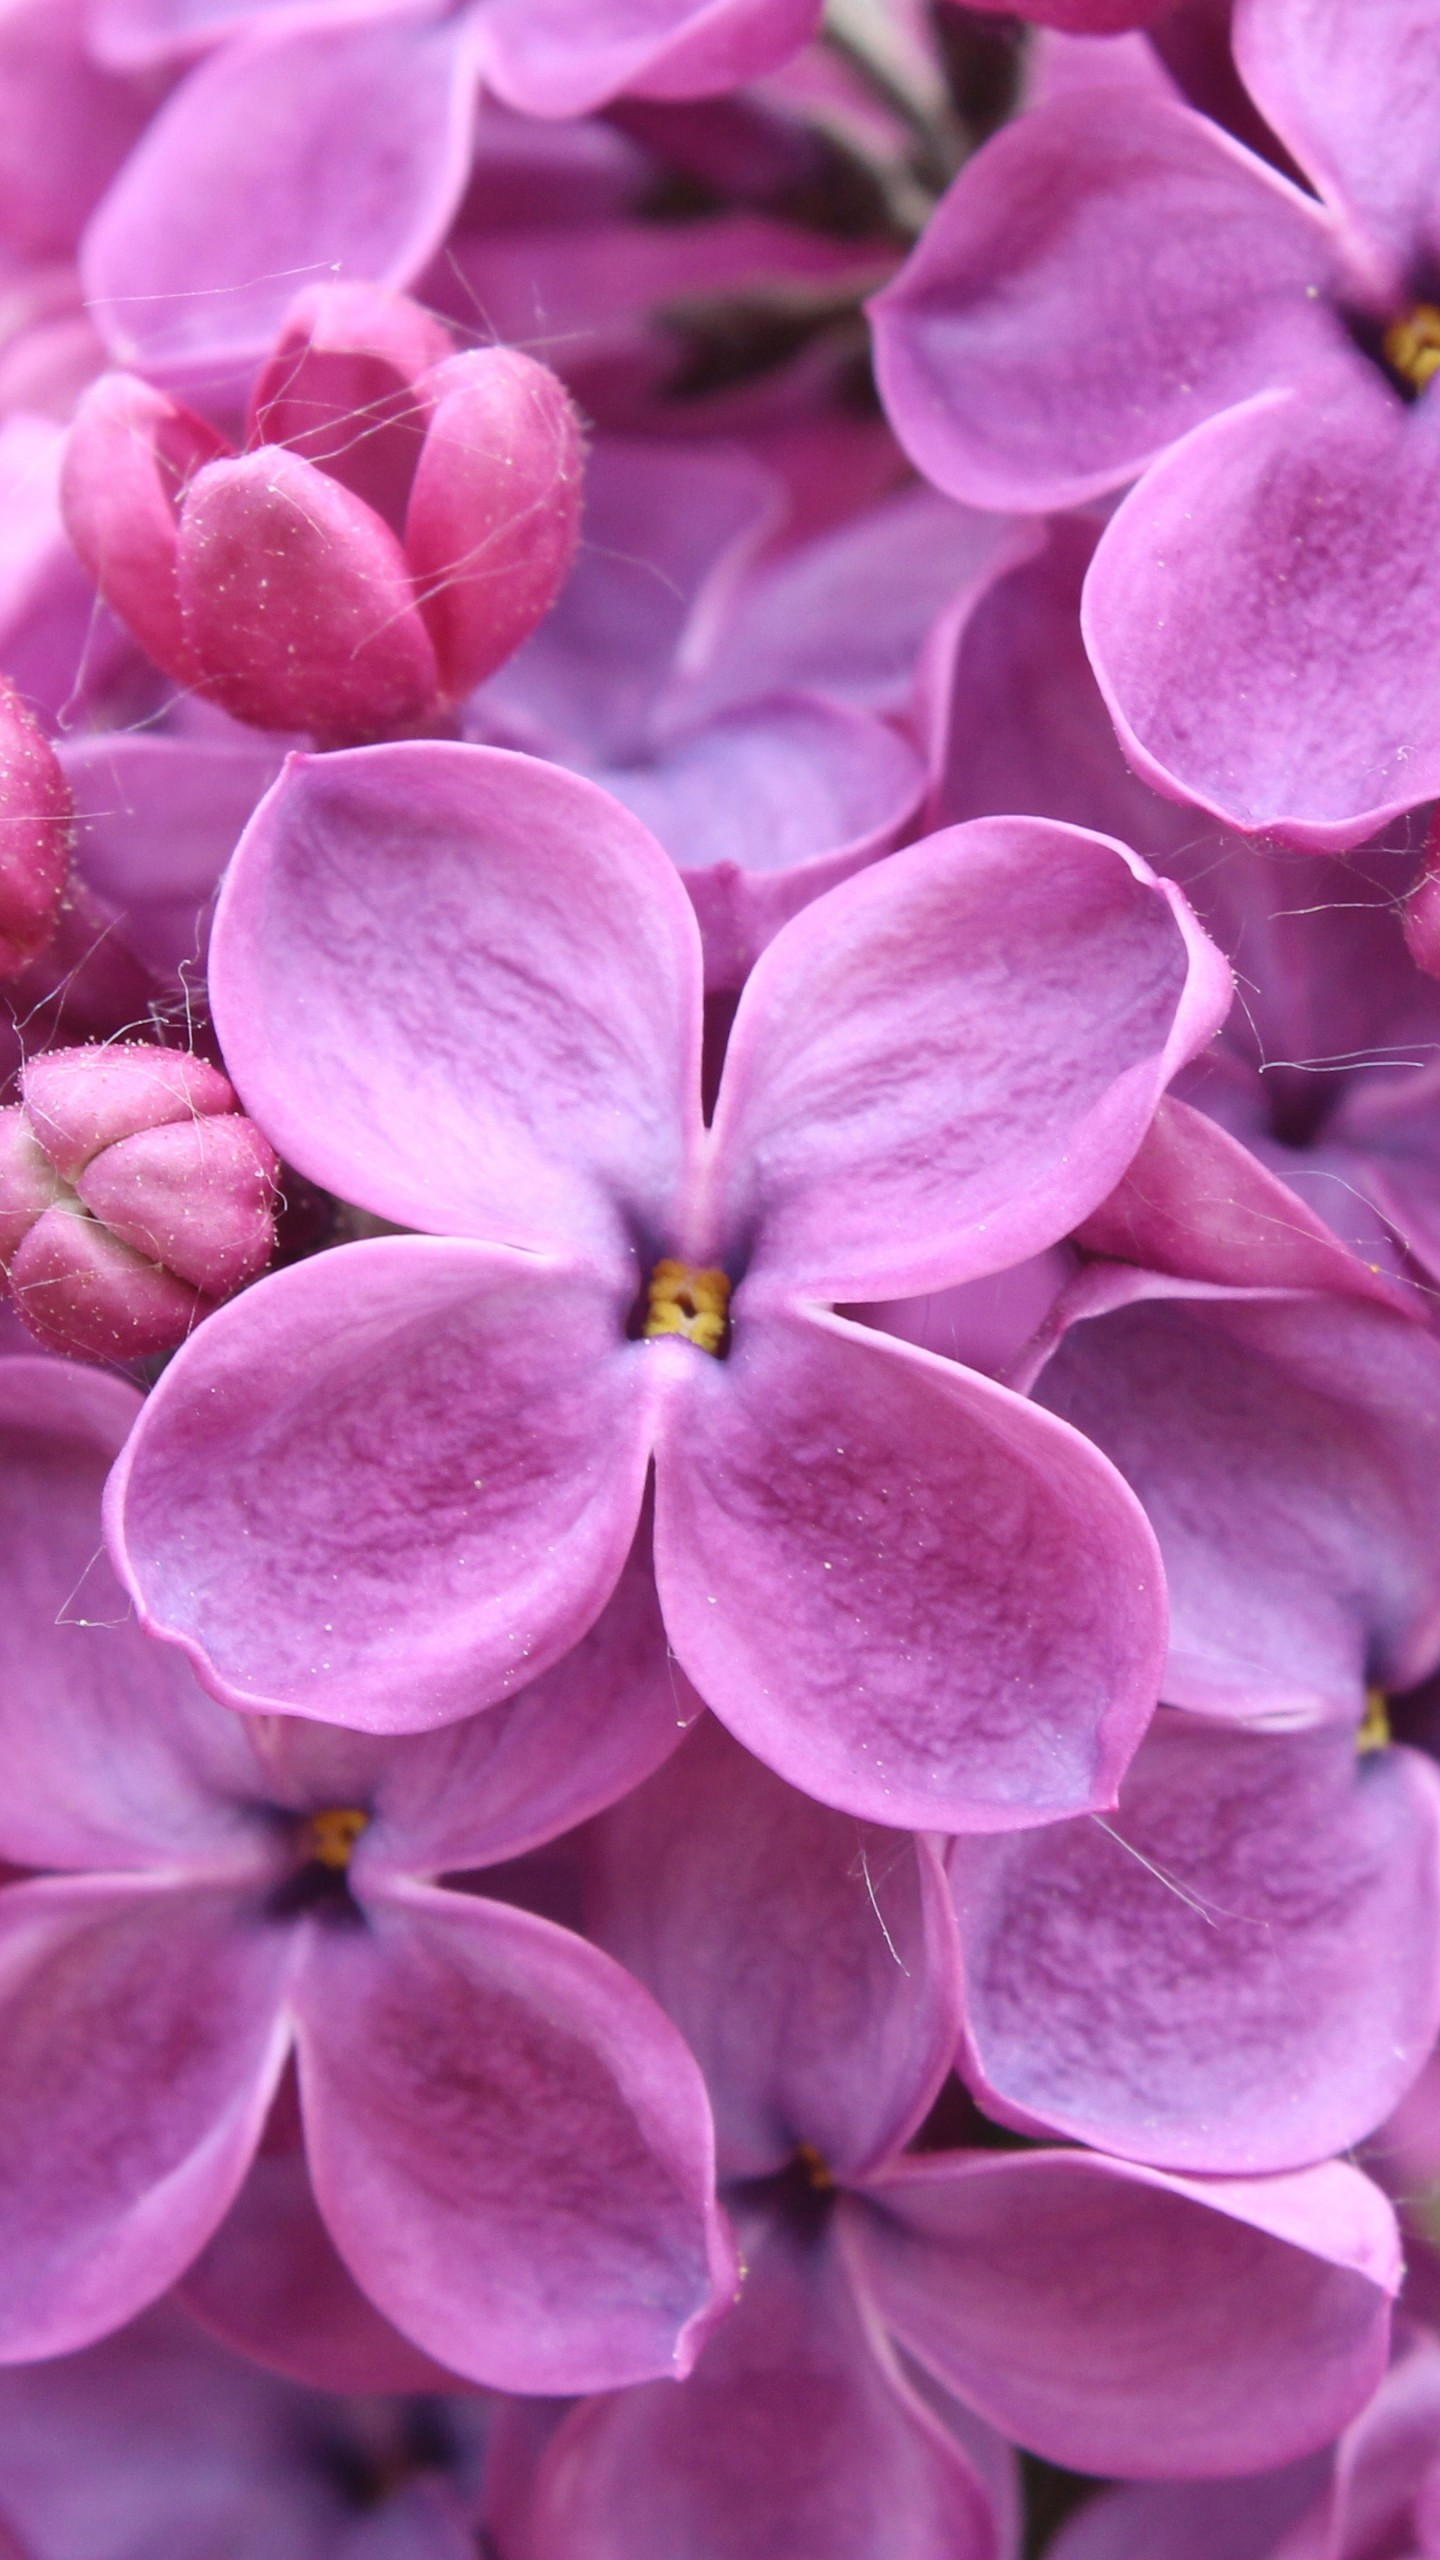 Wallpaper Purple 5k 4k Wallpaper 8k Lilac Flowers Nature 9661